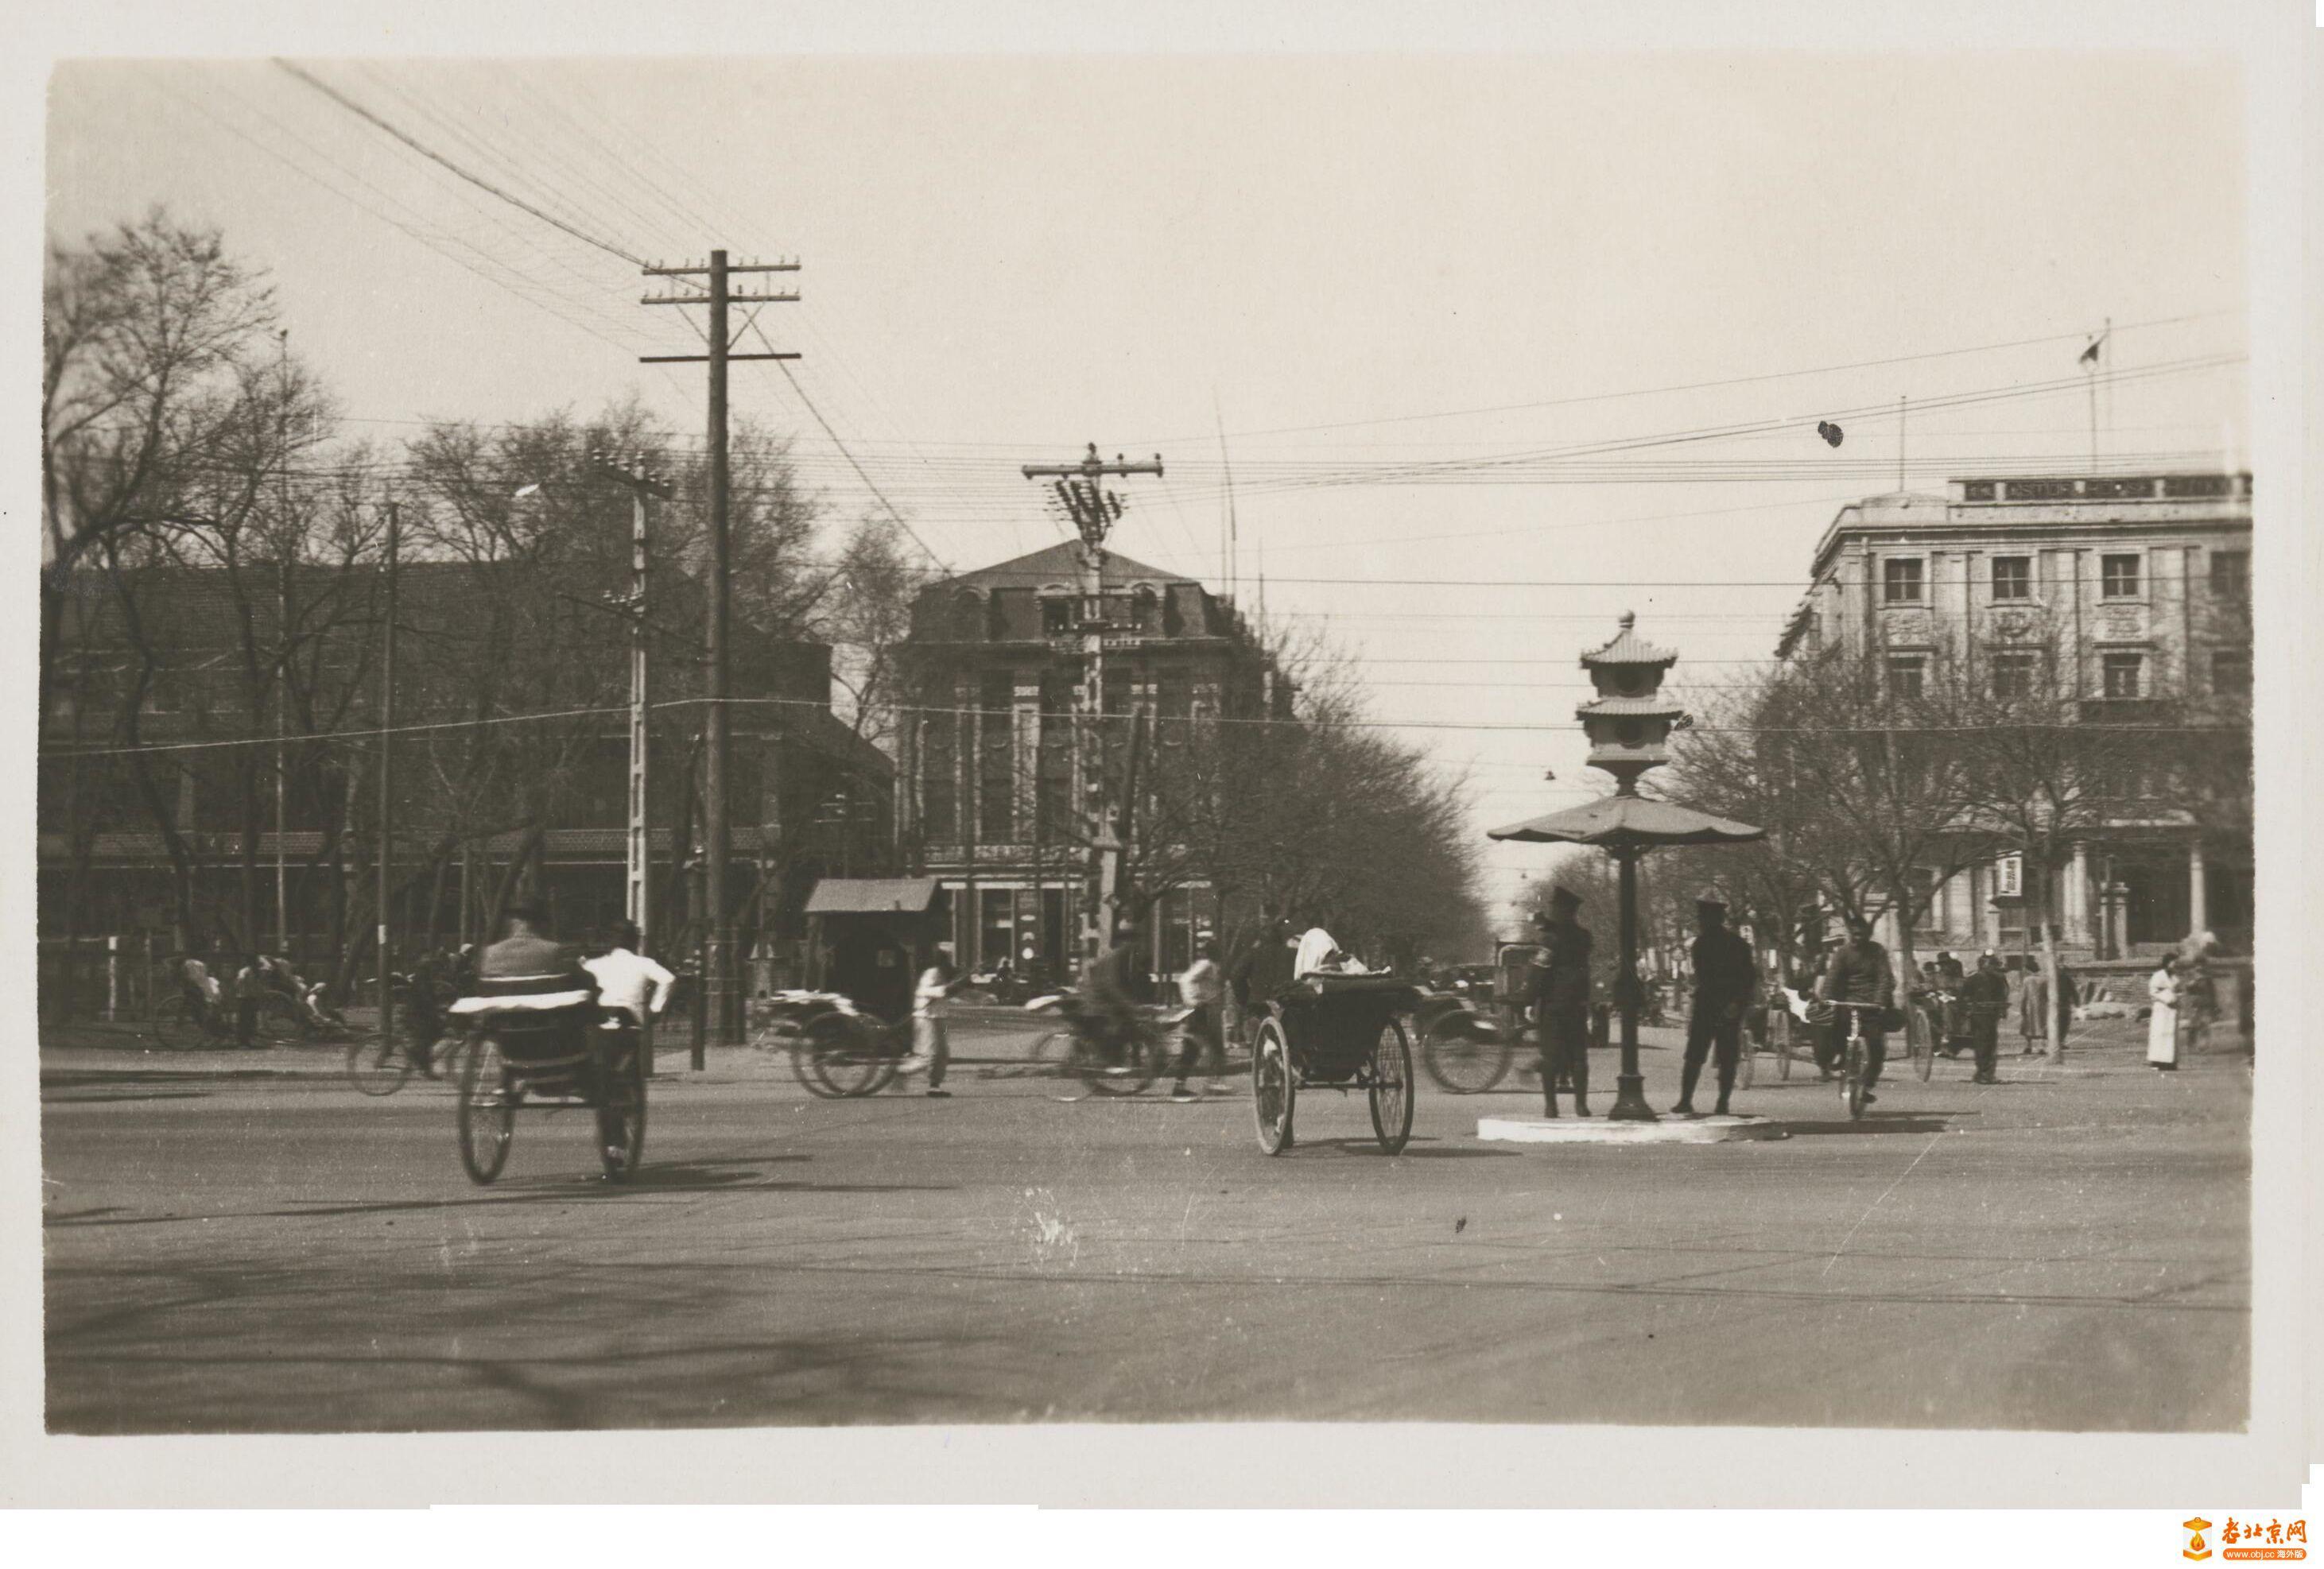 RE: 1935年的北京街市